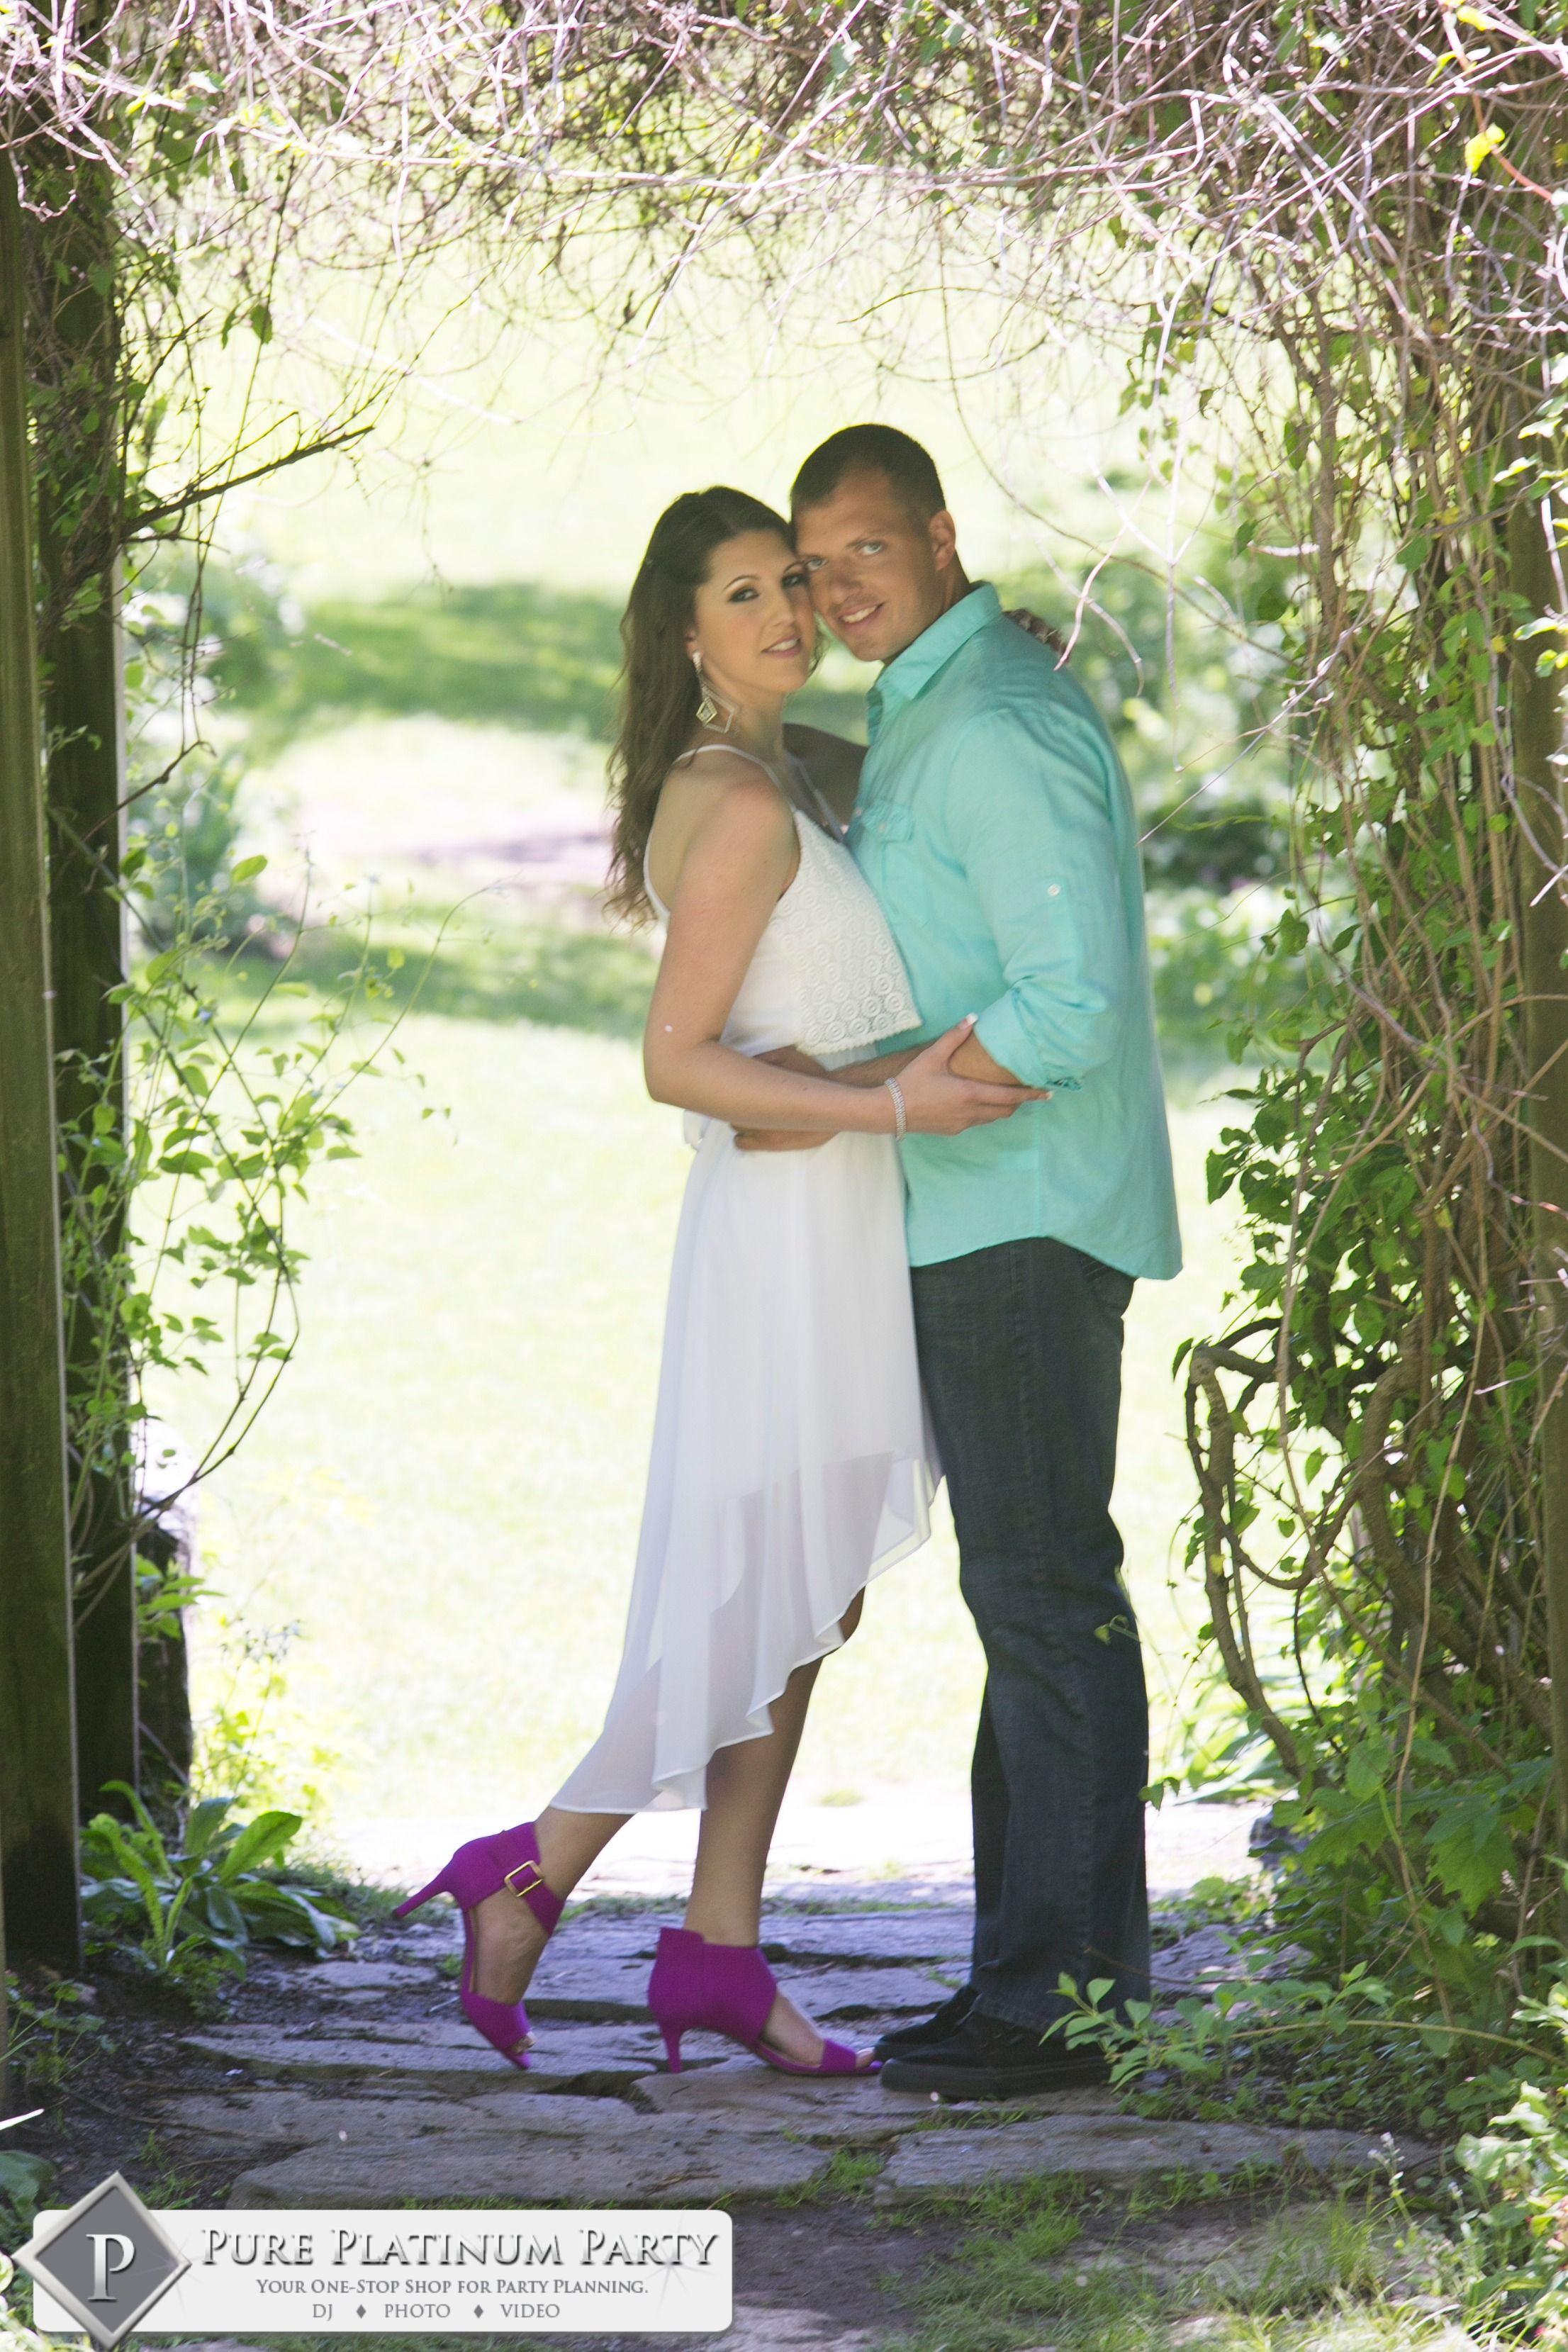 Renee & Craig #wedding #bride #groom #DJ #weddingphotos #weddingphotography #entertainment #photography #marriage #djdeals #photographydeals #weddingentertainment #weddingdj #weddingphotographs #weddingphotographer #weddingdiscjockey #njdjs #njdj #njphotographers #njweddingphotographers #njweddingdjs #nydjsb #nyweddingdjs #nyweddingphotographers #nyweddings #njweddings #pureplatinumparty #RingwoodBotanicalGardens #SkylandManorCastle #militarywedding #militaryengagement